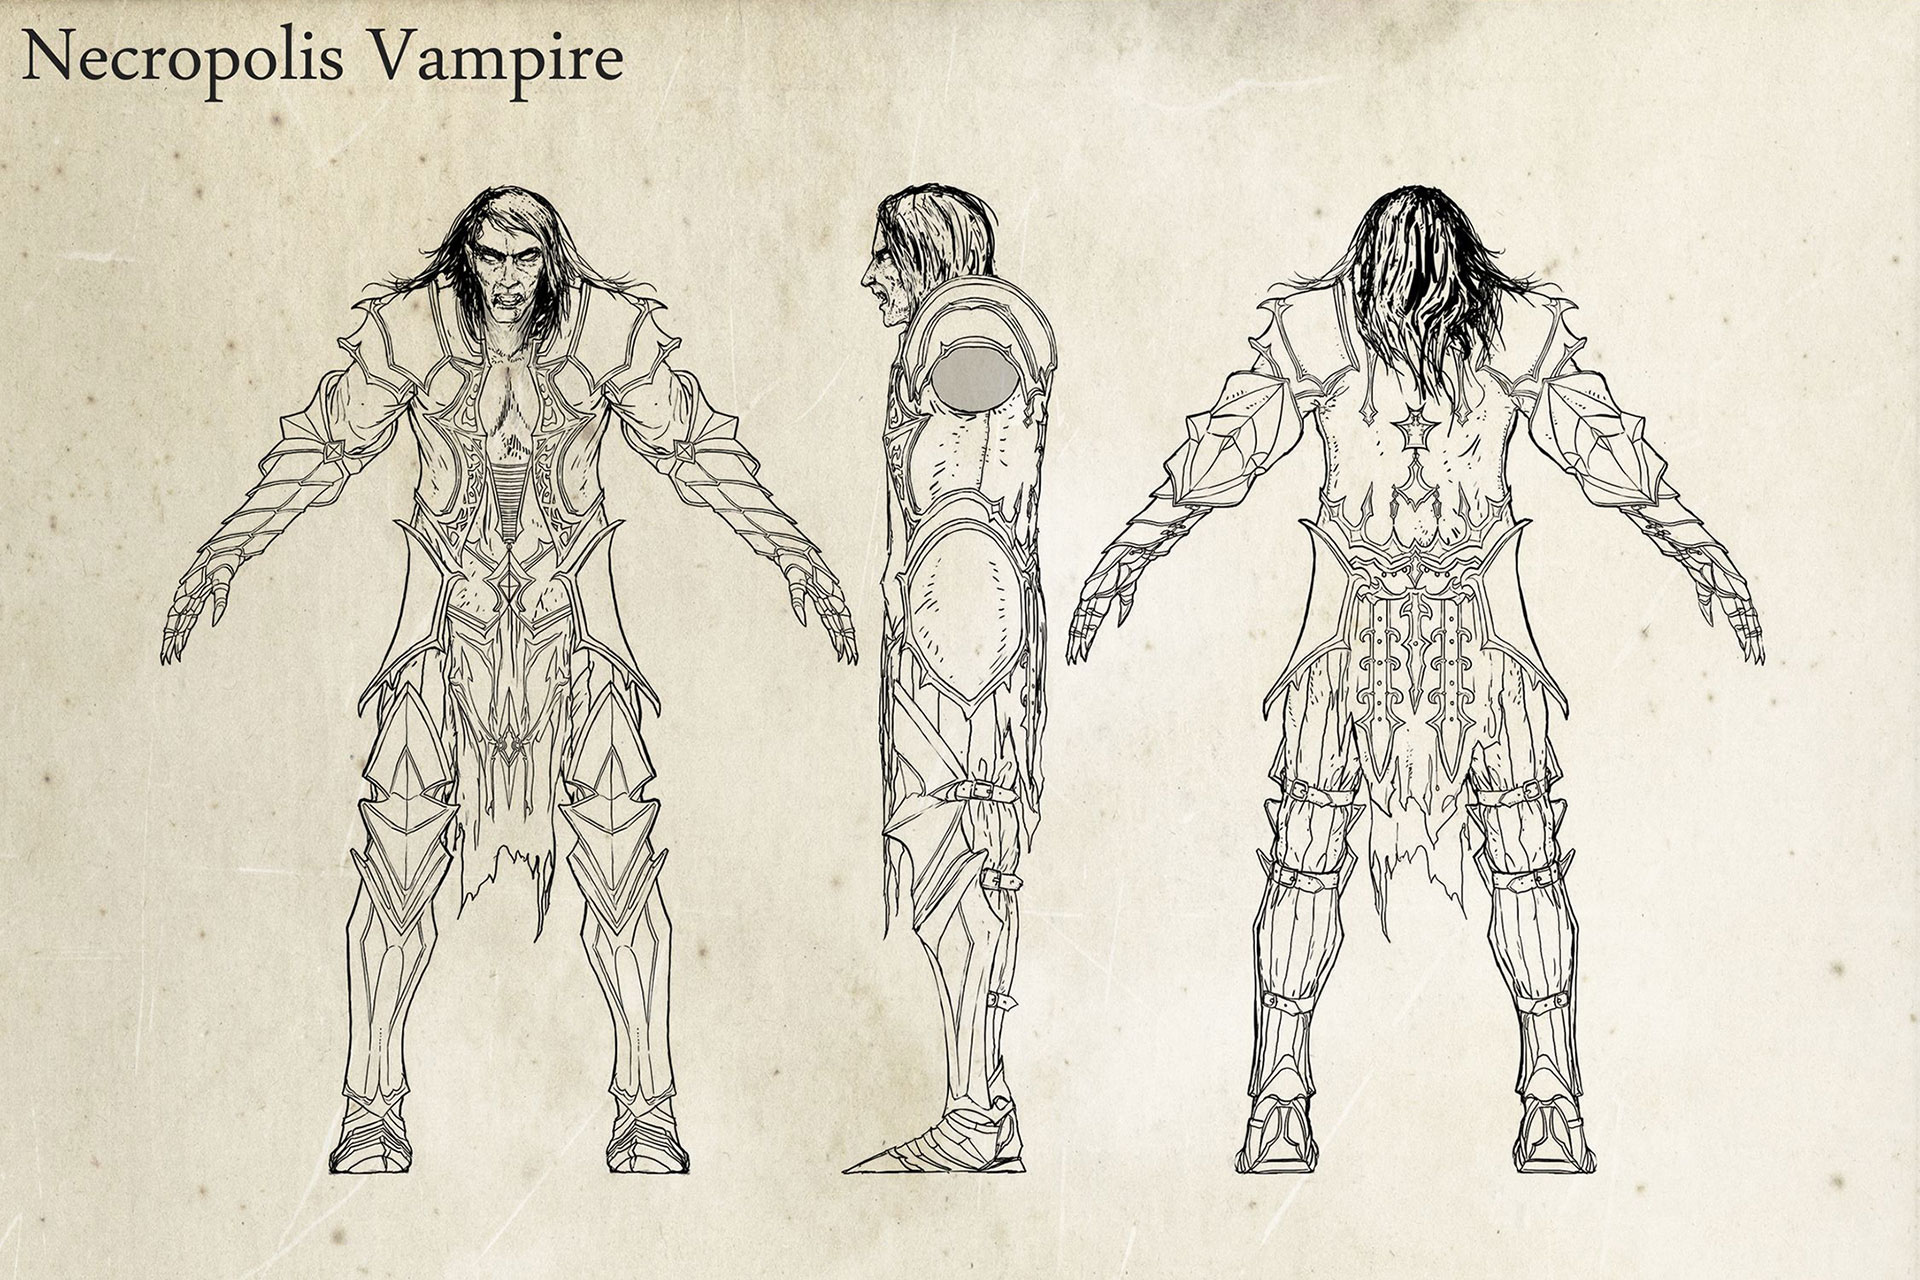 https://ubistatic-a.akamaihd.net/0004/prod/images/150722_cbe6ce5c83/Necro_Vampire_T.jpg